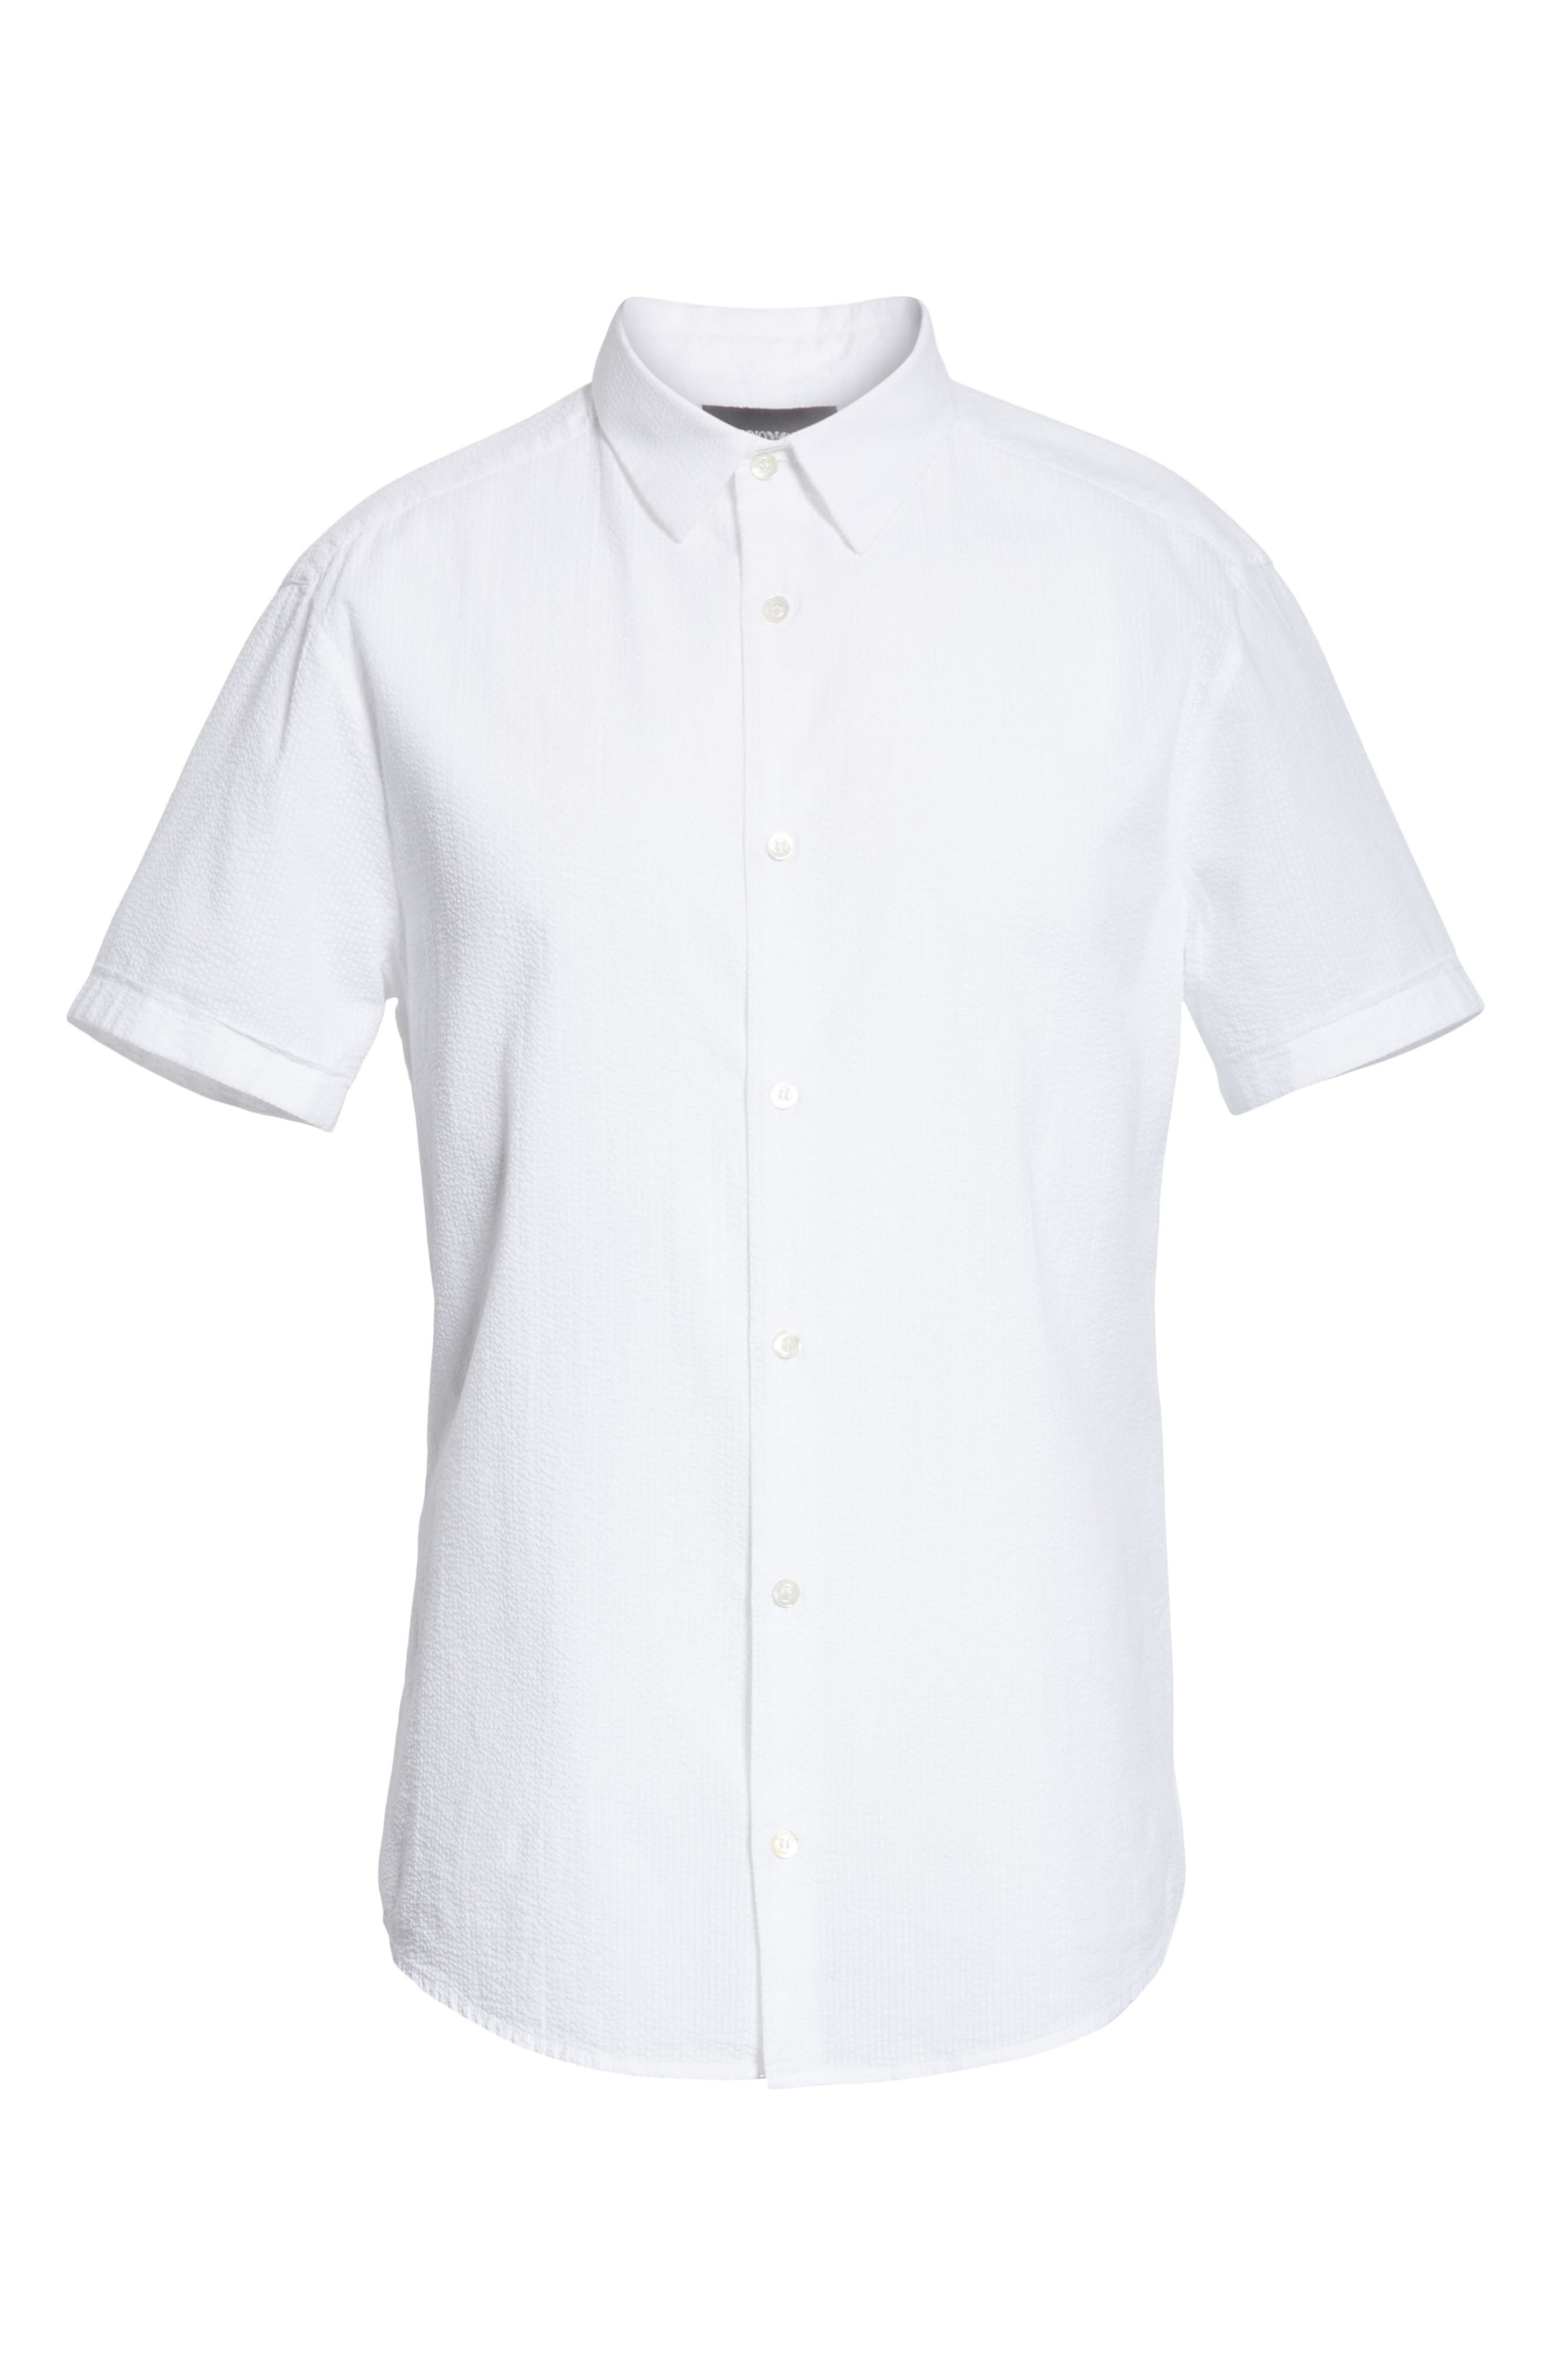 Regular Fit Short Sleeve Sport Shirt,                             Alternate thumbnail 6, color,                             BIANCO OTTICO